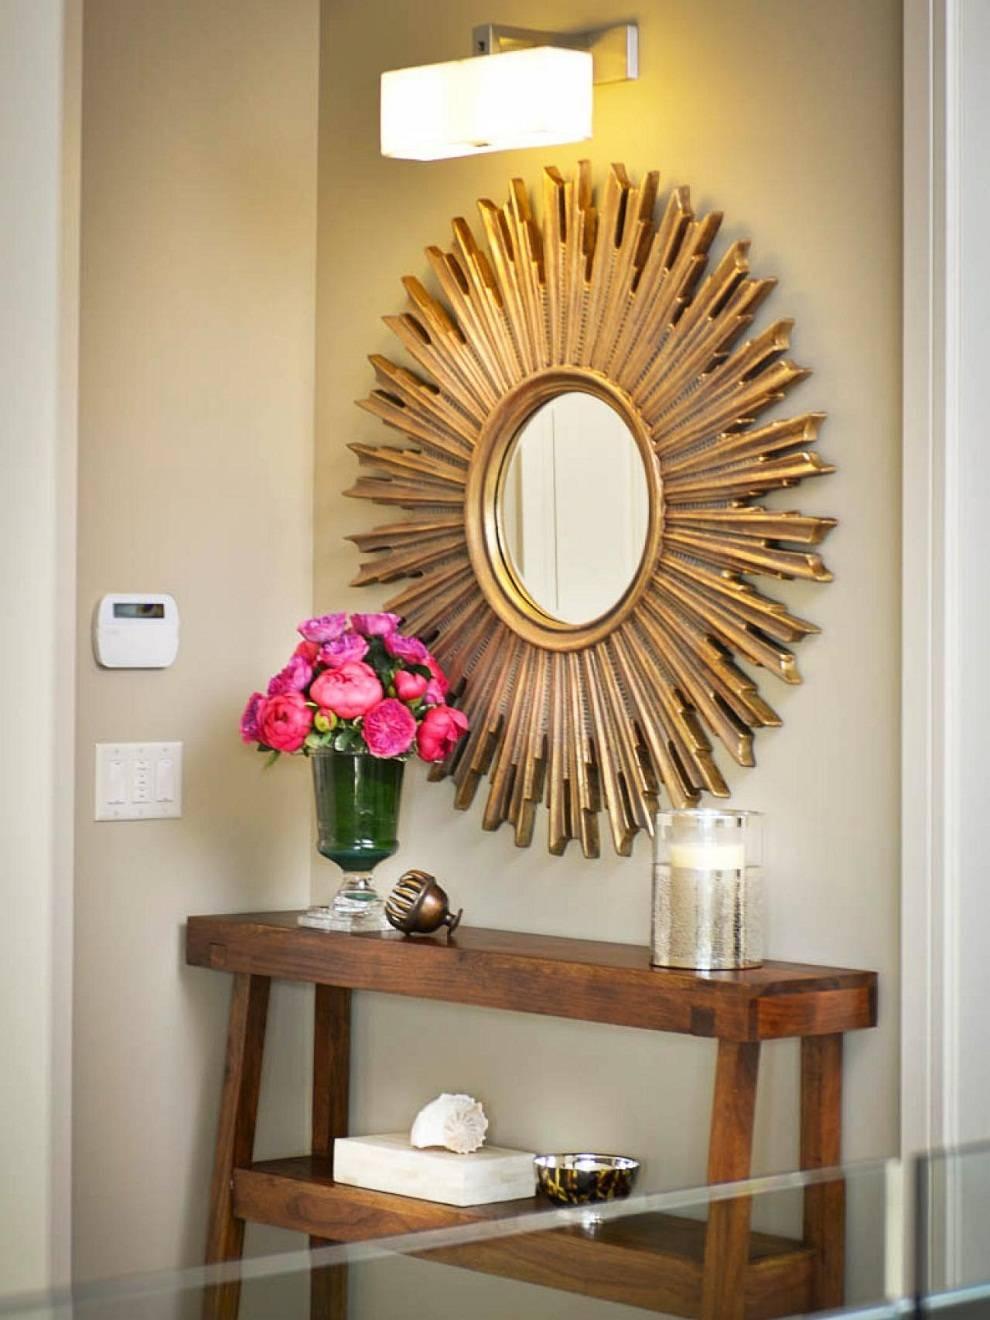 Sunburst Mirrors For Sale 115 Breathtaking Decor Plus Sunburst within Bronze Starburst Mirrors (Image 25 of 25)